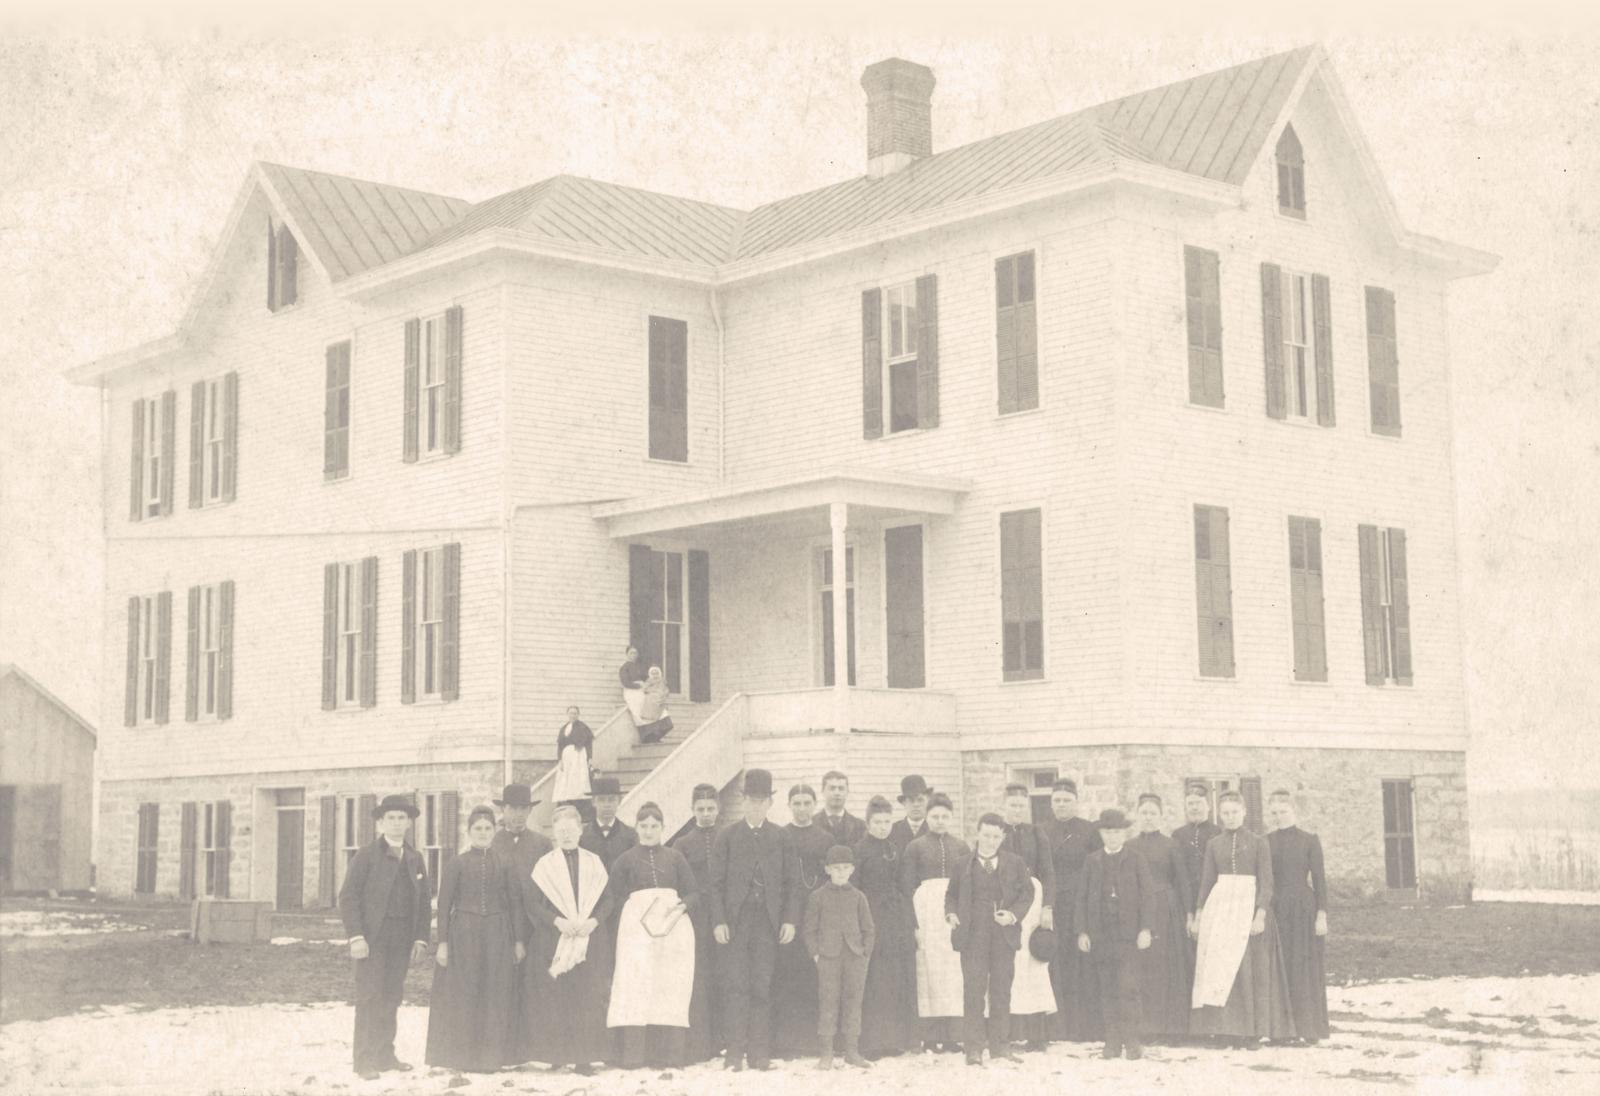 Scattergood in 1890 Final Crop Proof